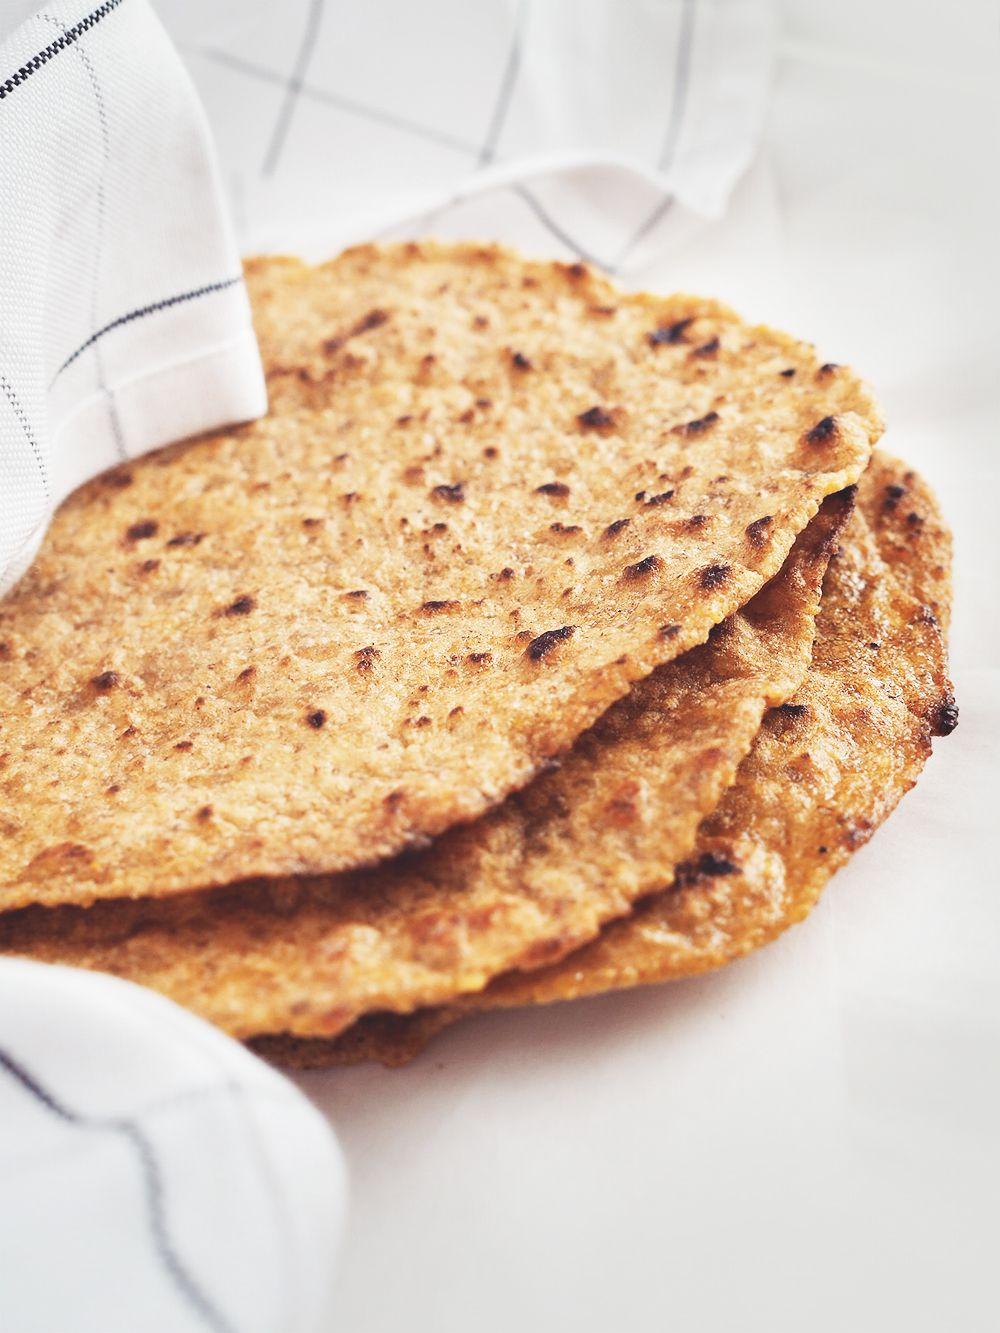 tortilla zplantana – eatmeplease.pl